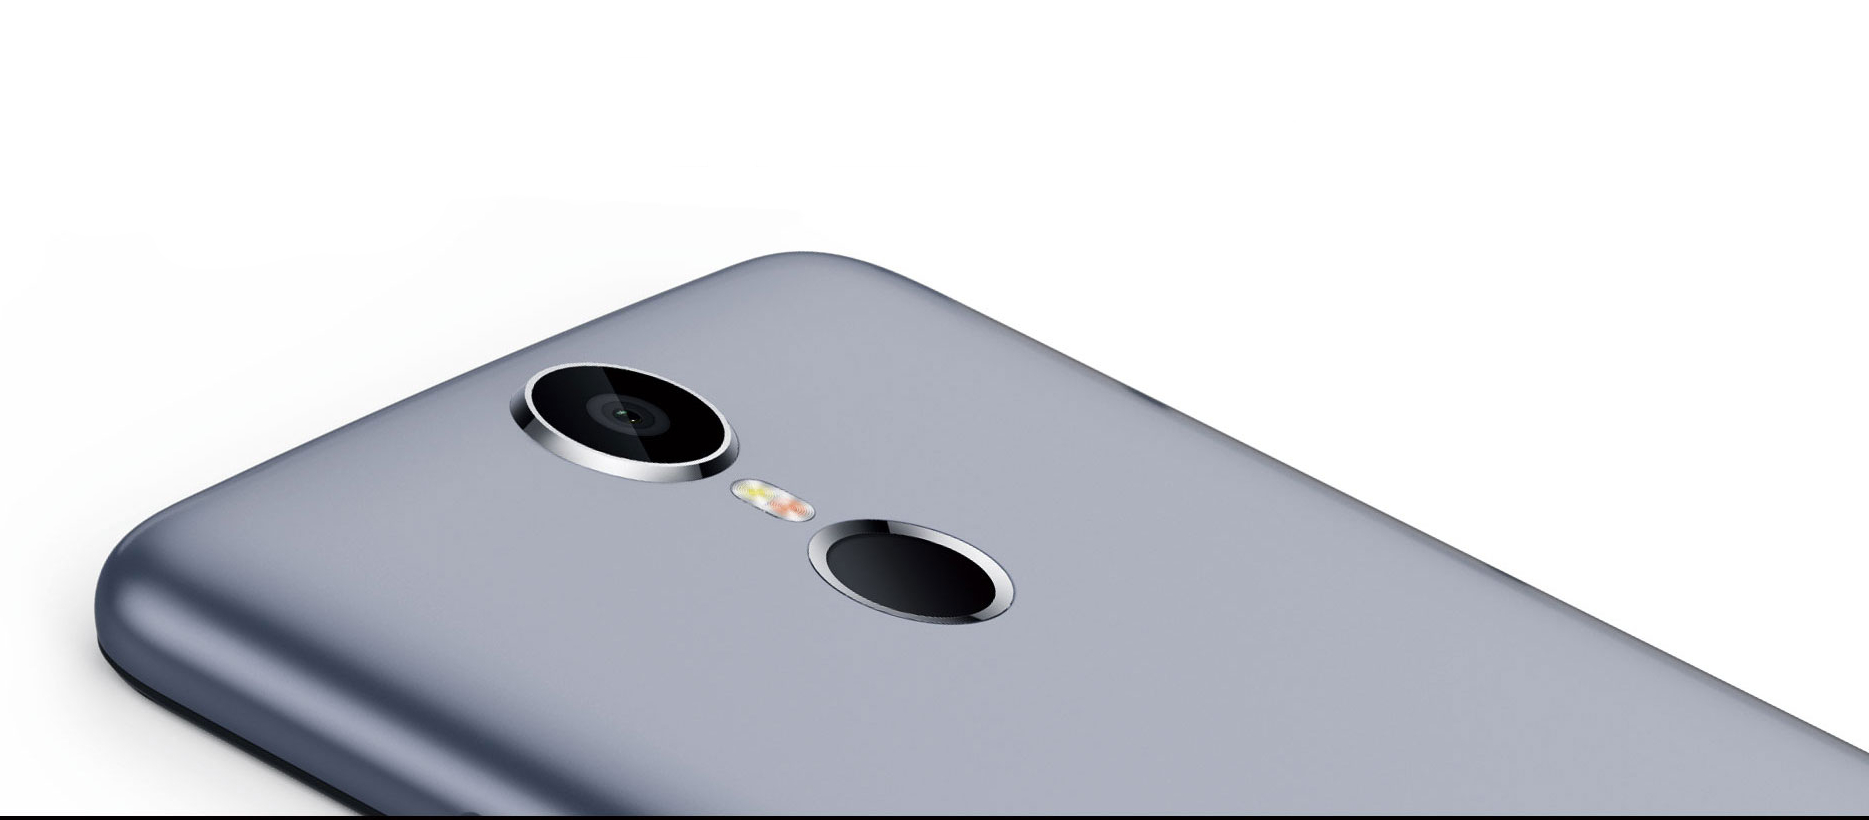 Ulefone Vienna camera shown, grey phone on a white background.